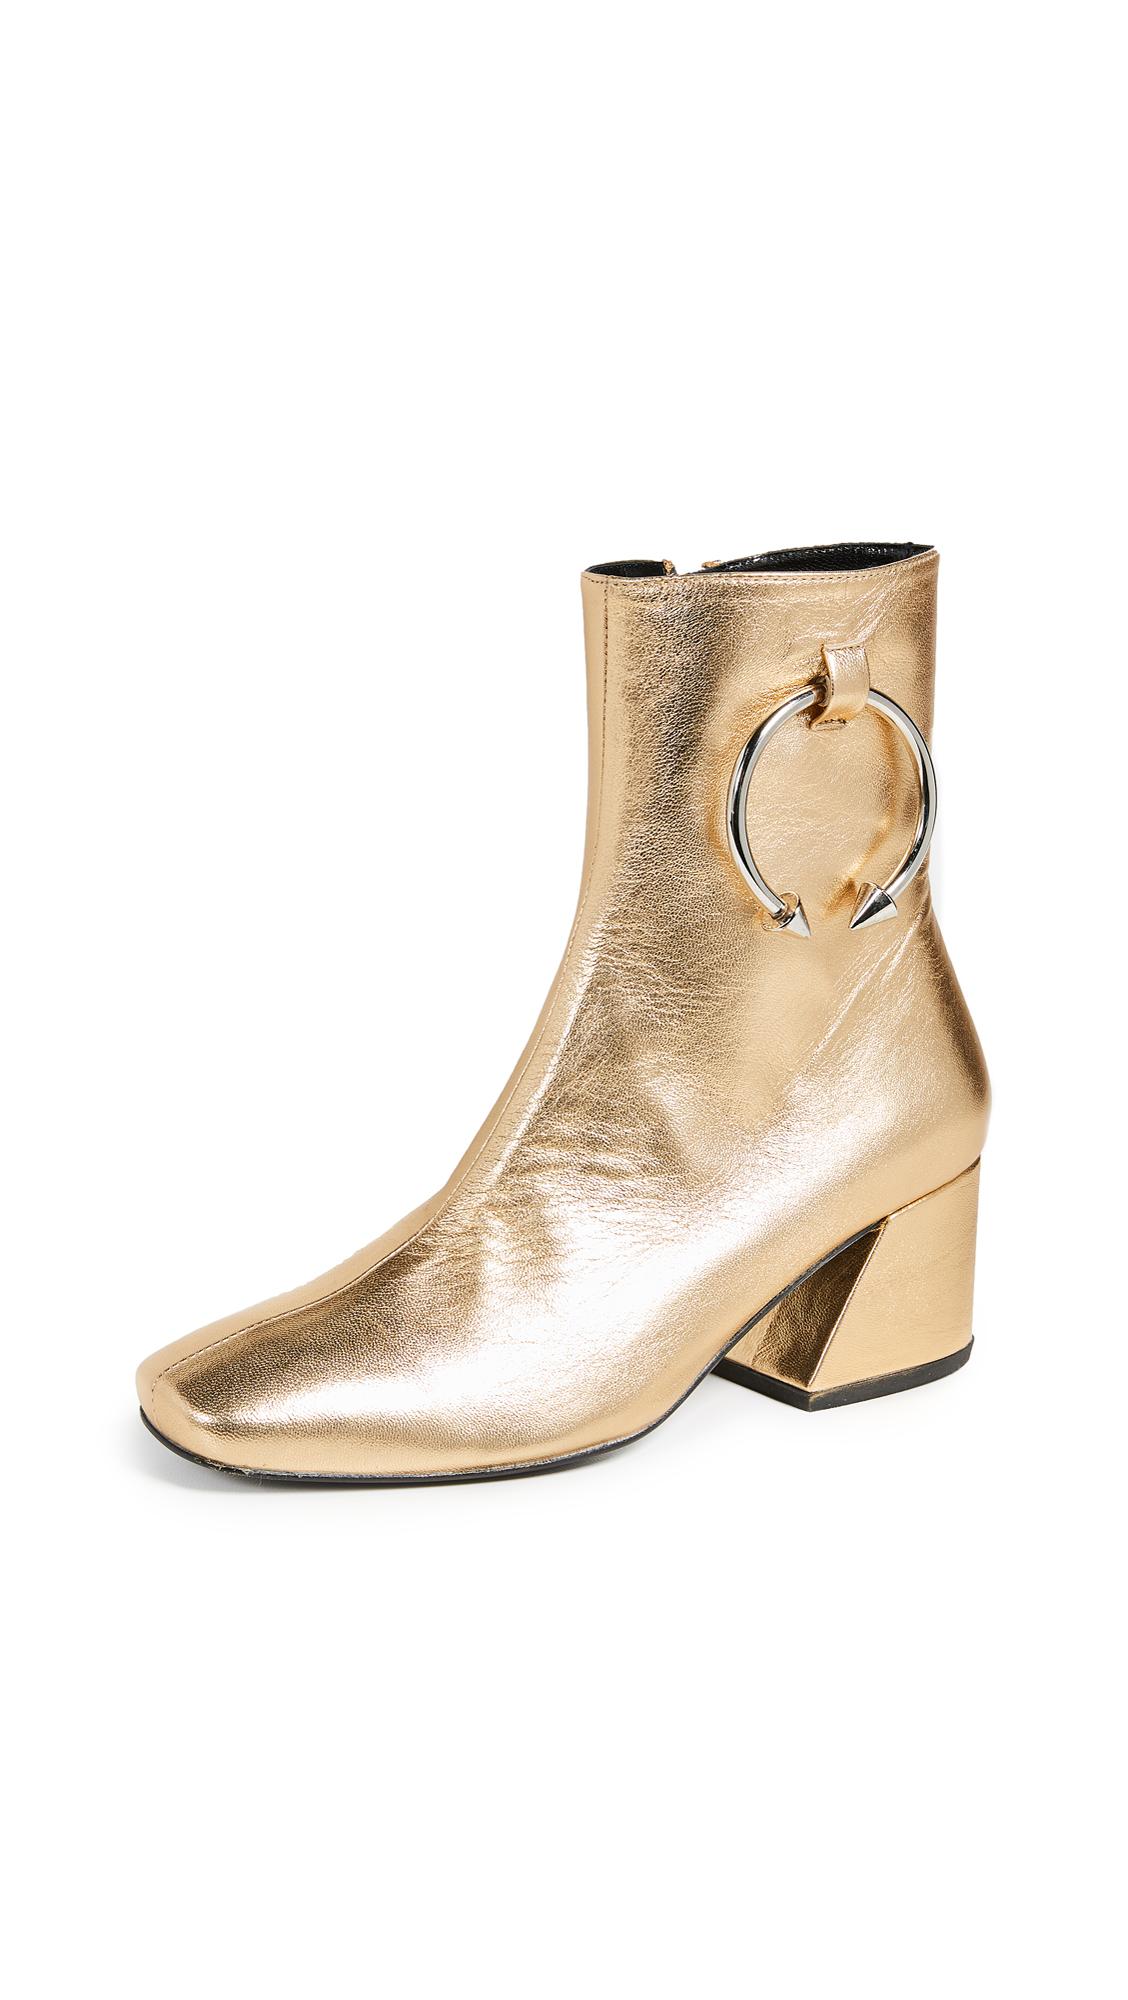 Dorateymur Nizip II Boots - Gold